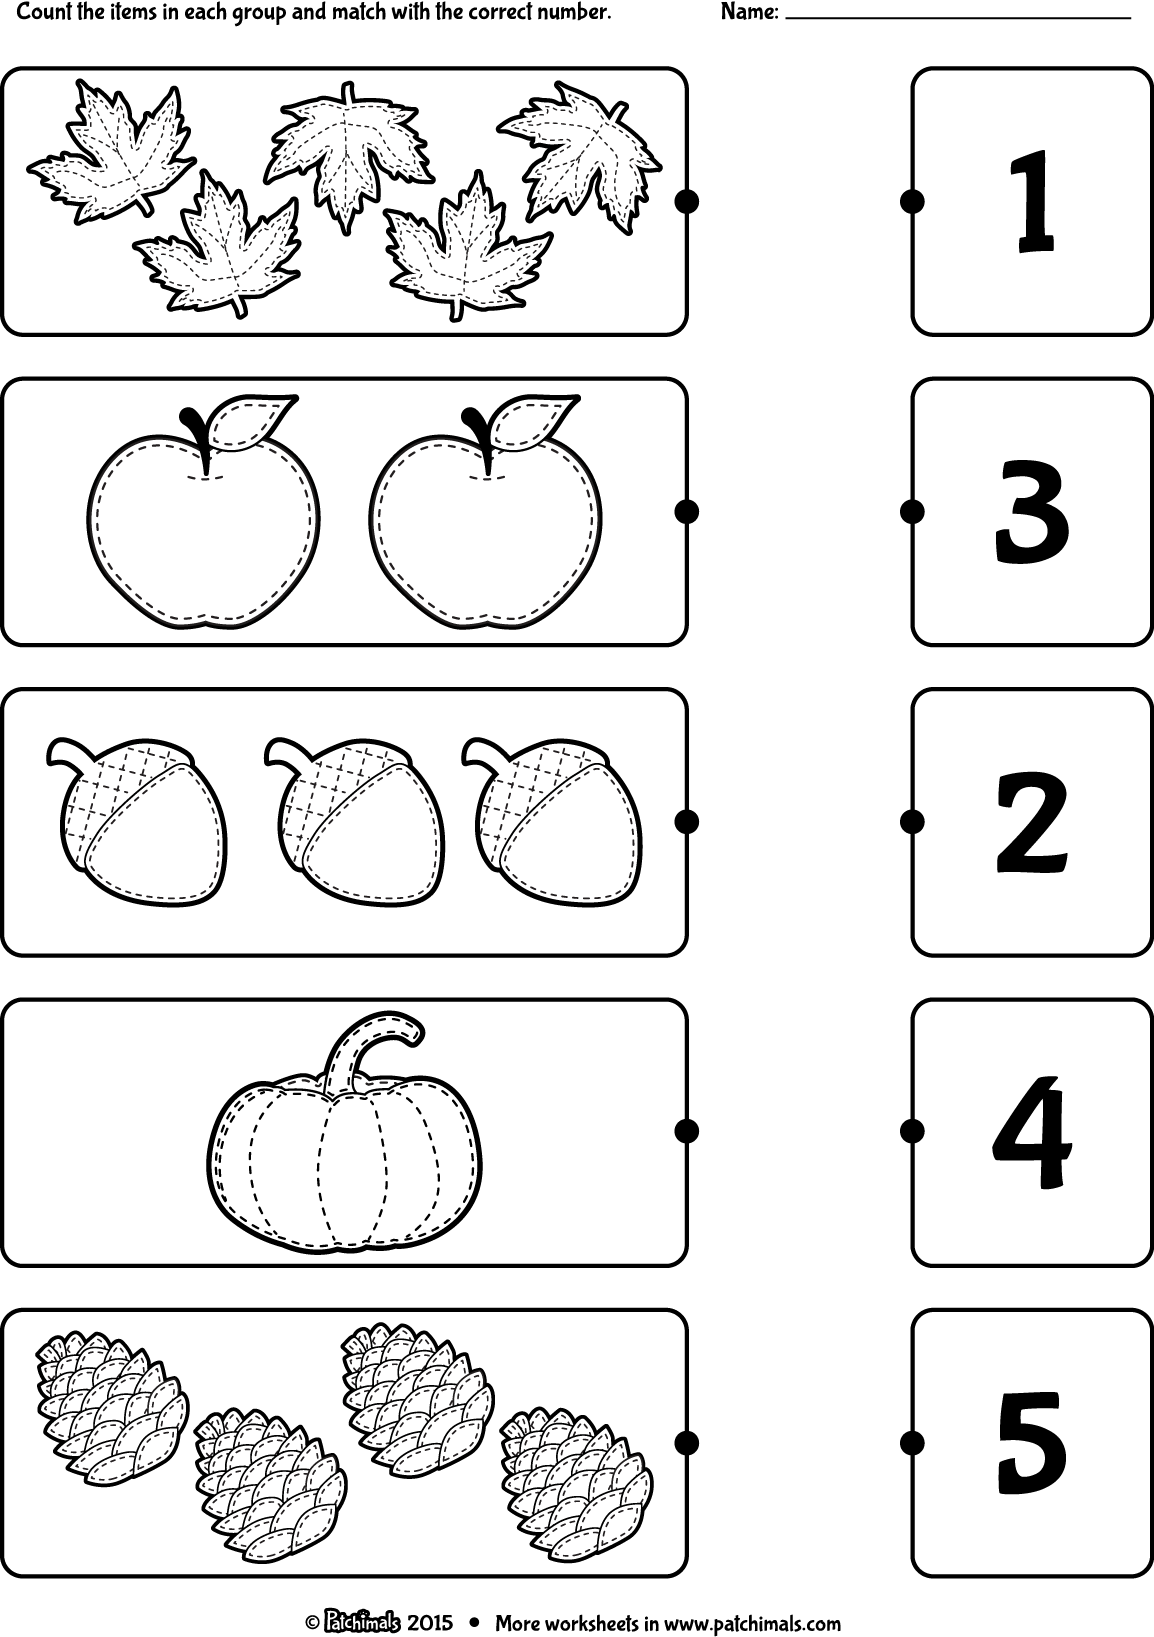 Free Math Worksheets For Preschool Or Kindergarten Apple Themed Classroom In 2020 Preschool Math Worksheets Preschool Worksheets Kindergarten Math Worksheets [ 1637 x 1154 Pixel ]